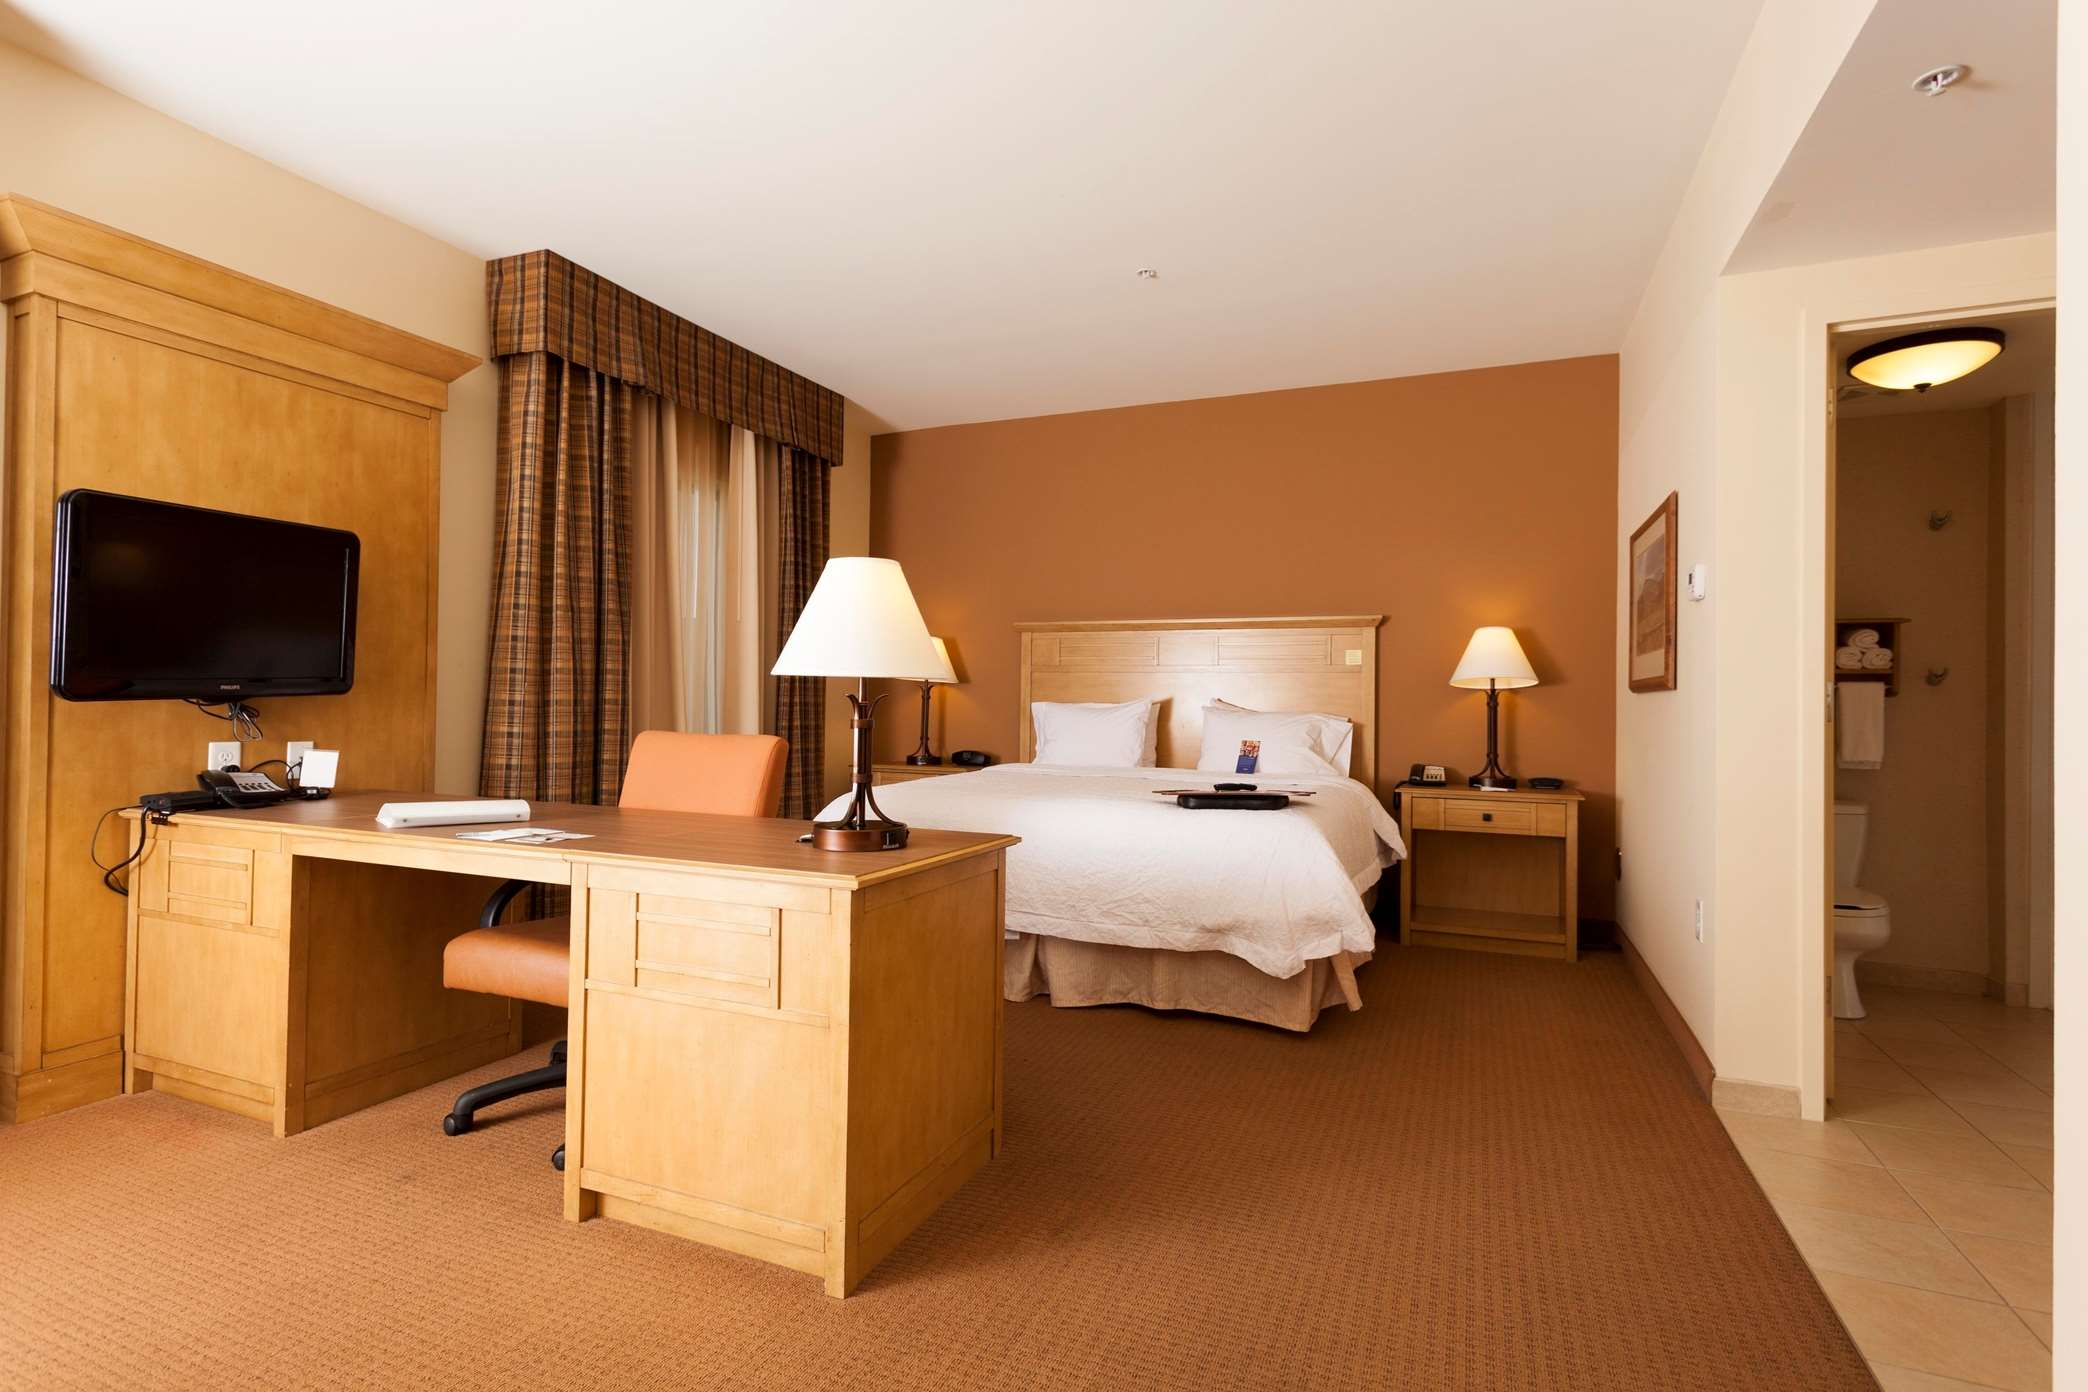 Hampton Inn & Suites Riverton image 34